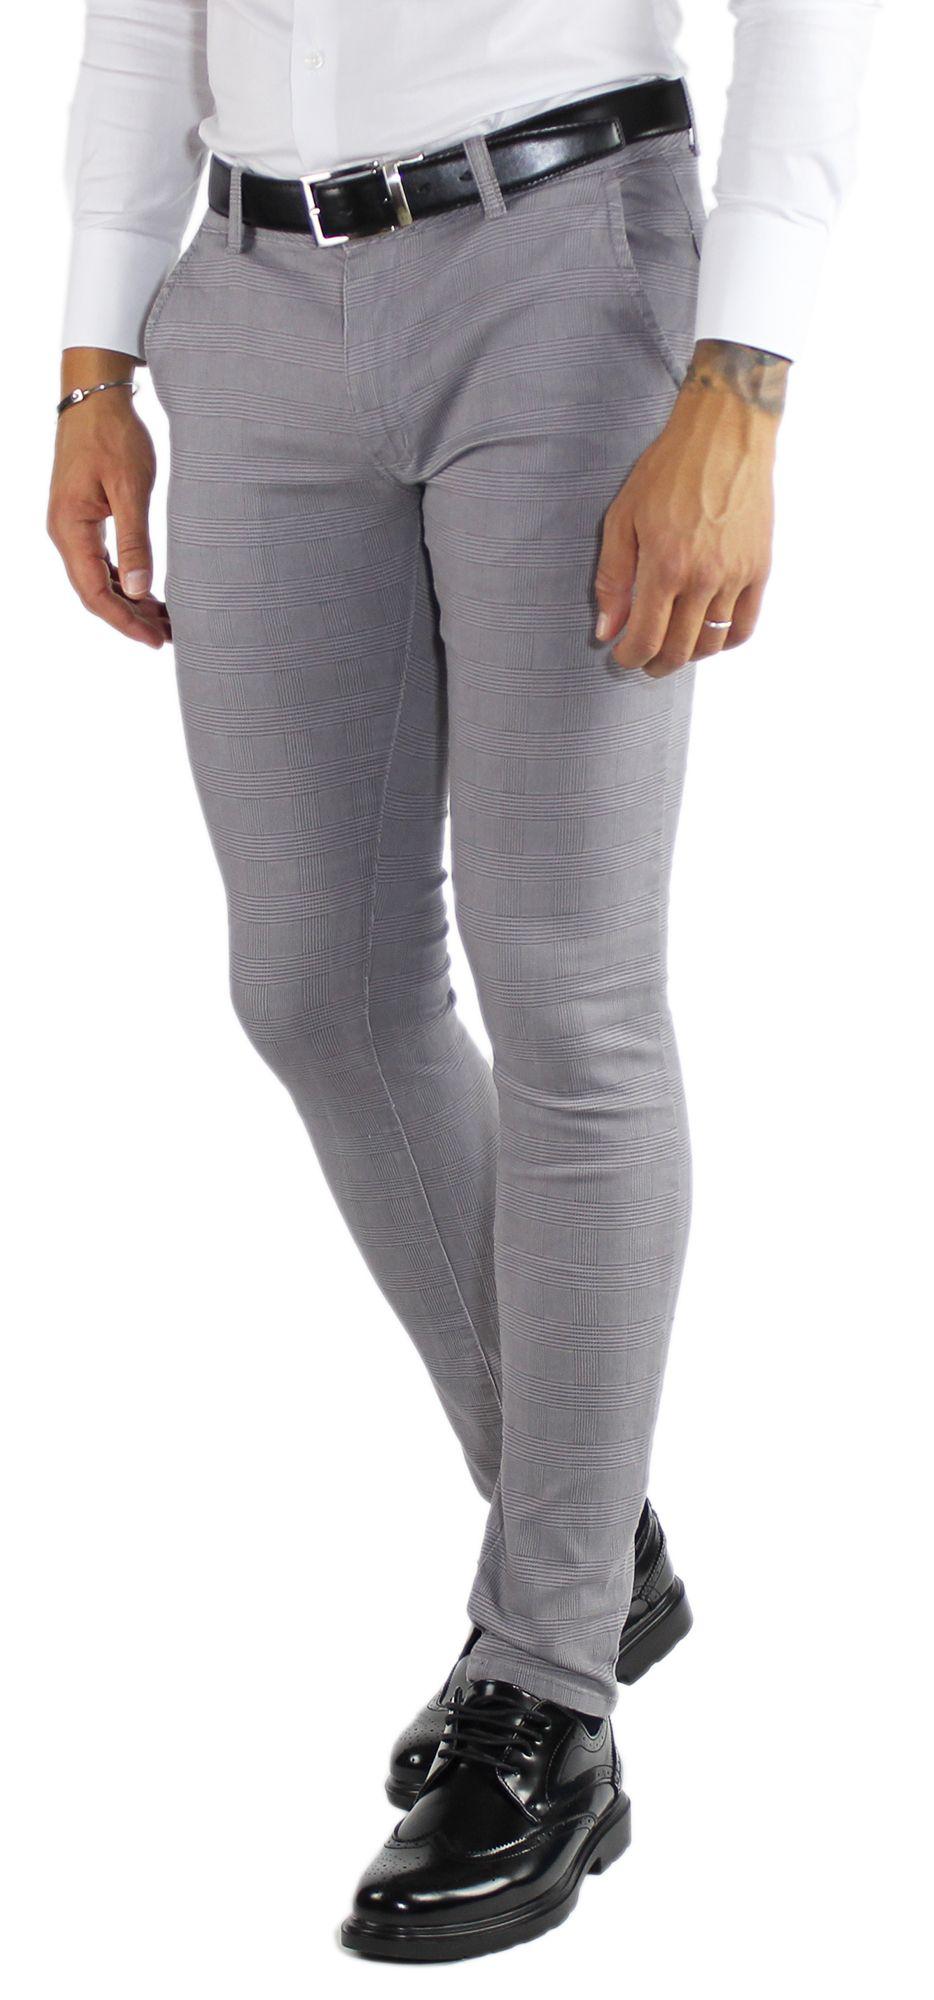 Pantaloni-Uomo-Invernali-a-Quadri-Eleganti-Pantalone-Slim-Fit-Elasticizzati-Scoz miniatura 4